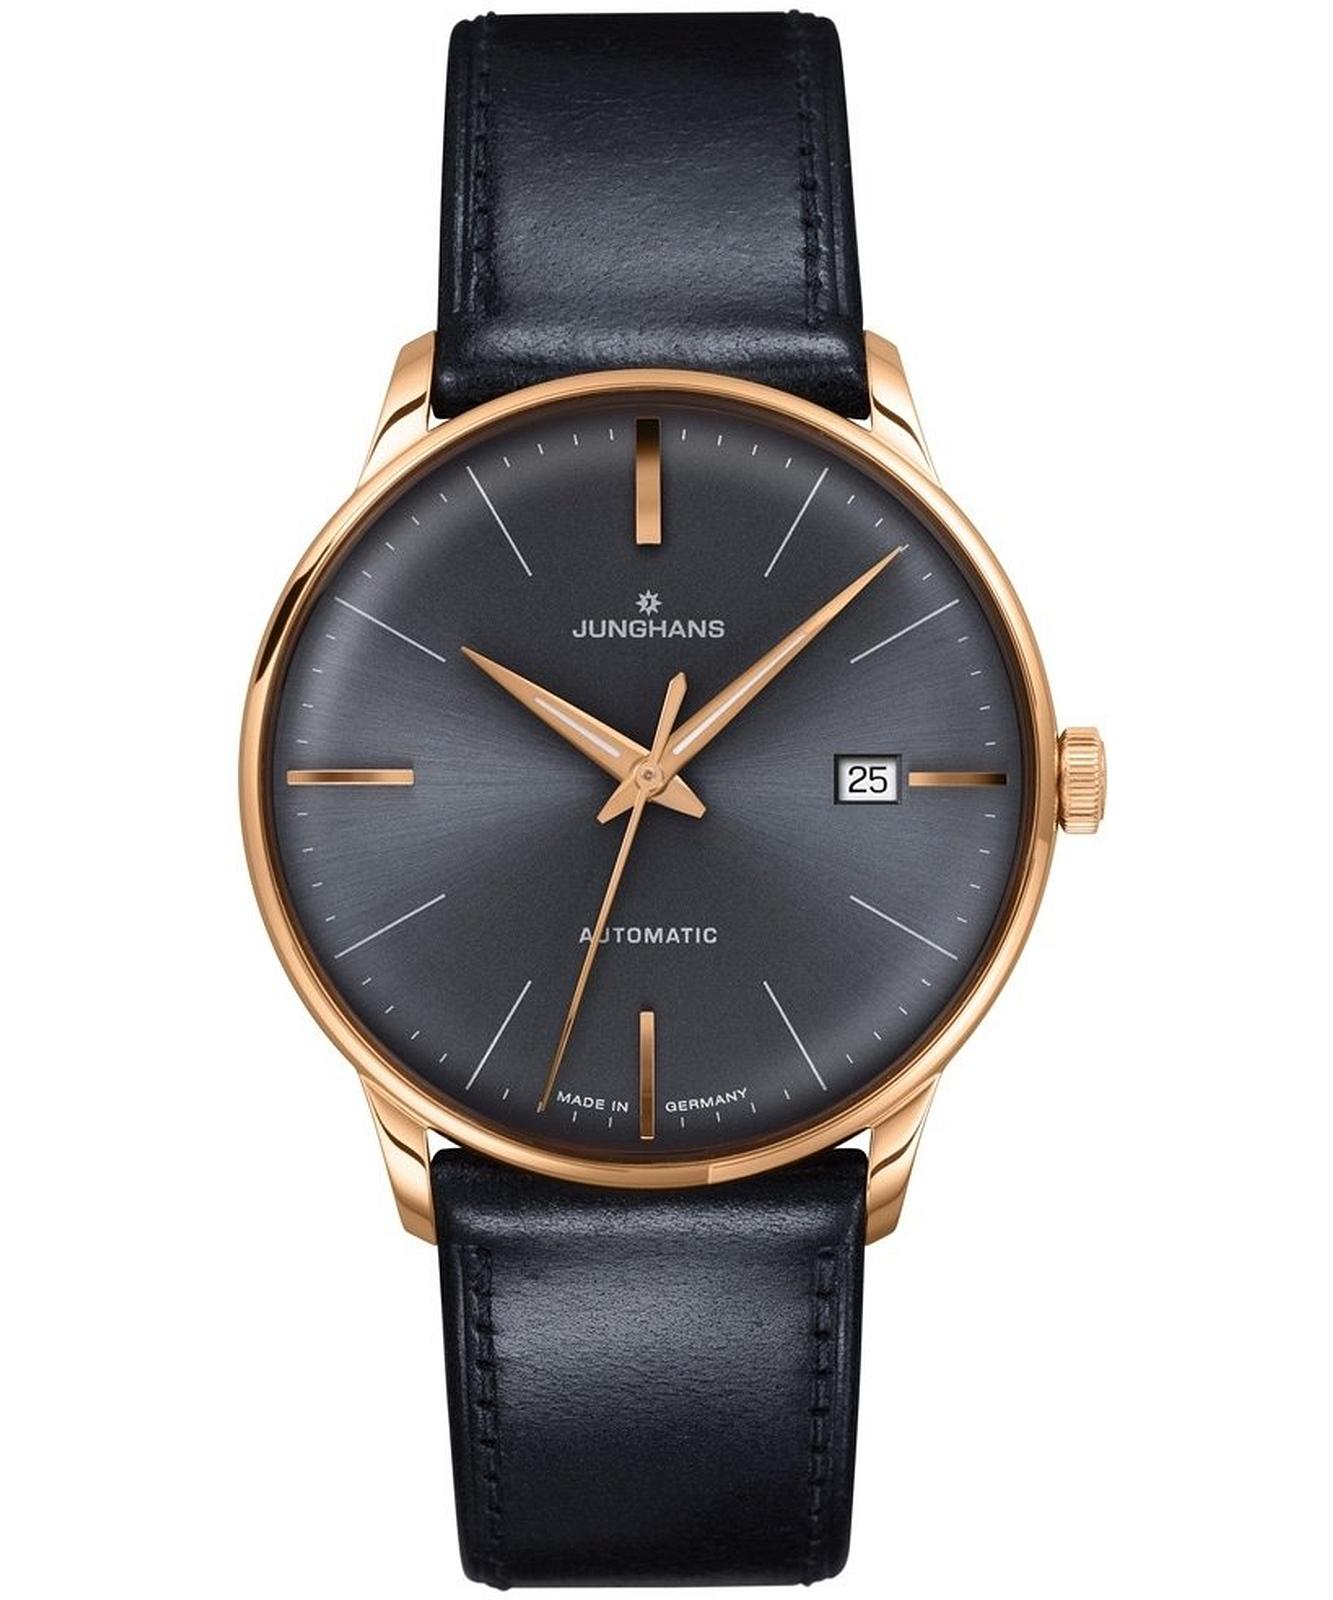 zegarek-meski-junghans-meister-classic-automatic-027-7513-00